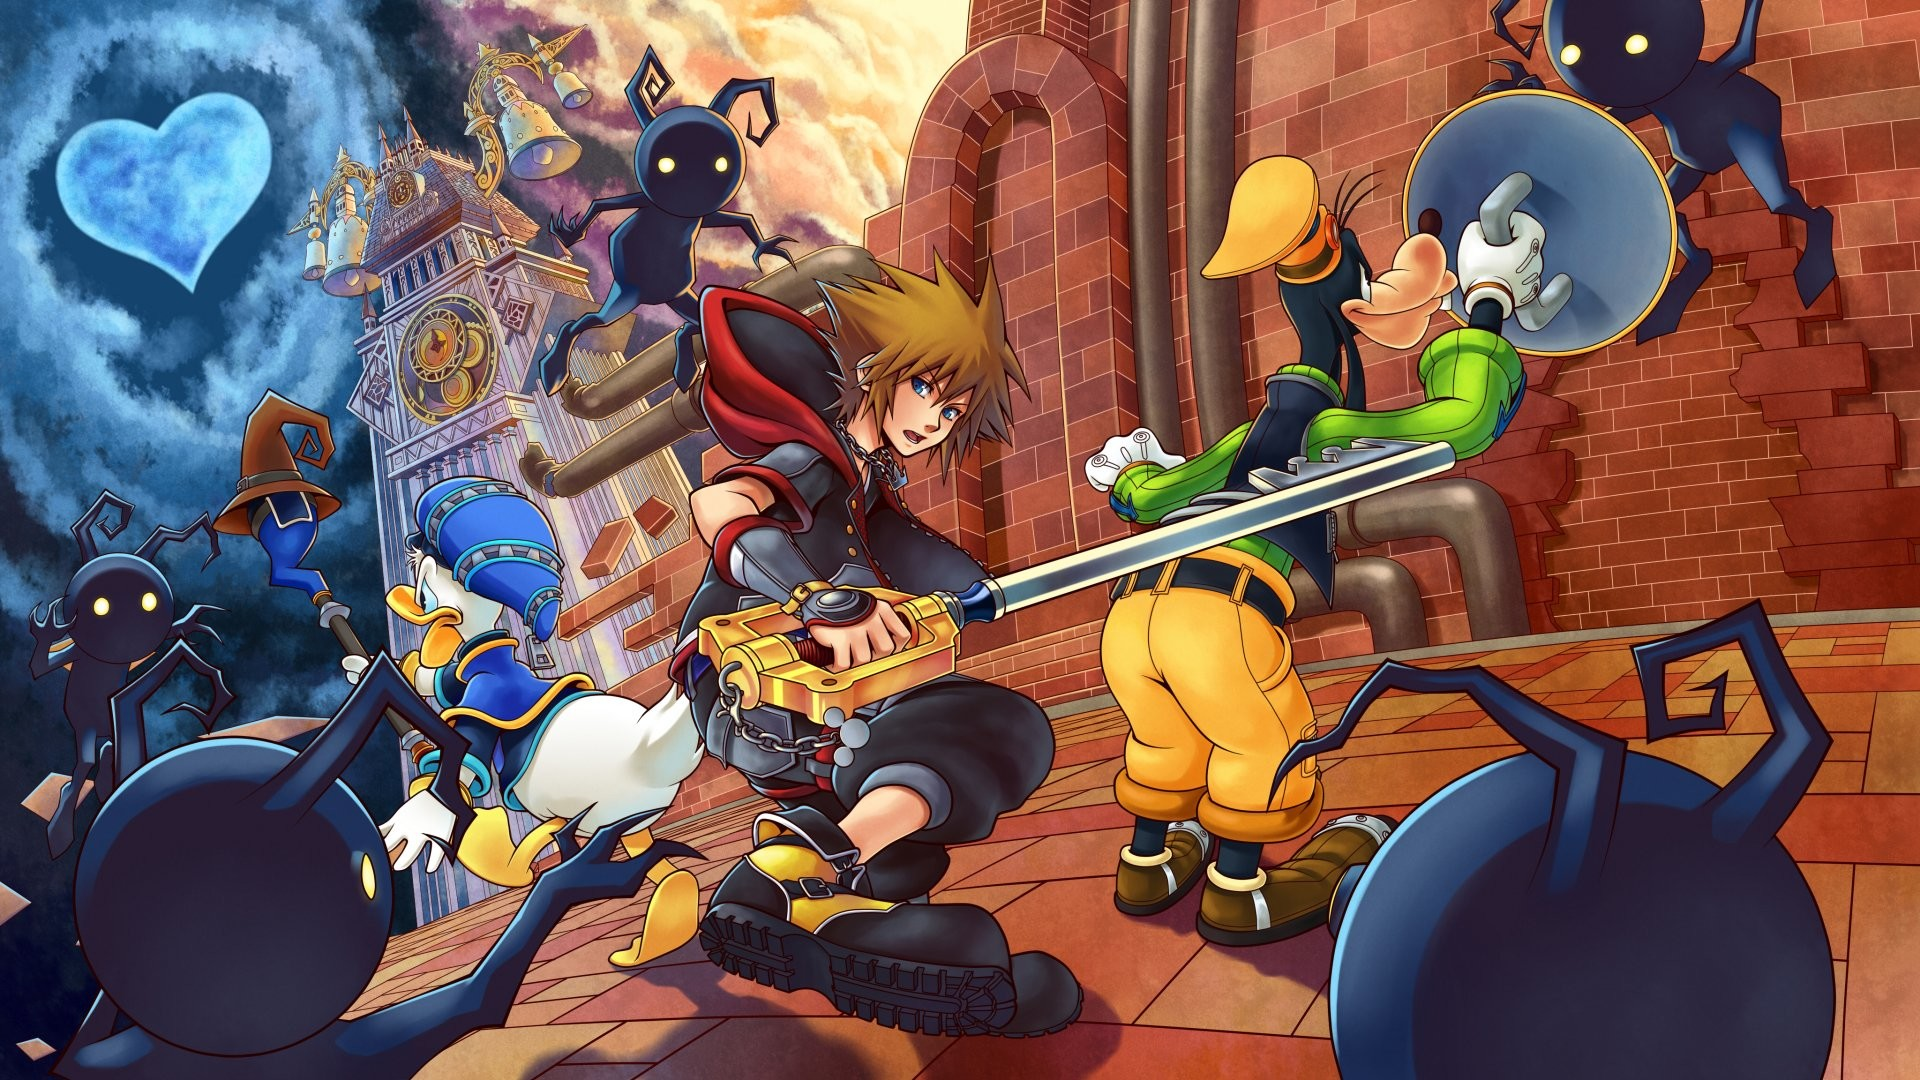 Kingdom Hearts 1 Wallpaper (73+ images)